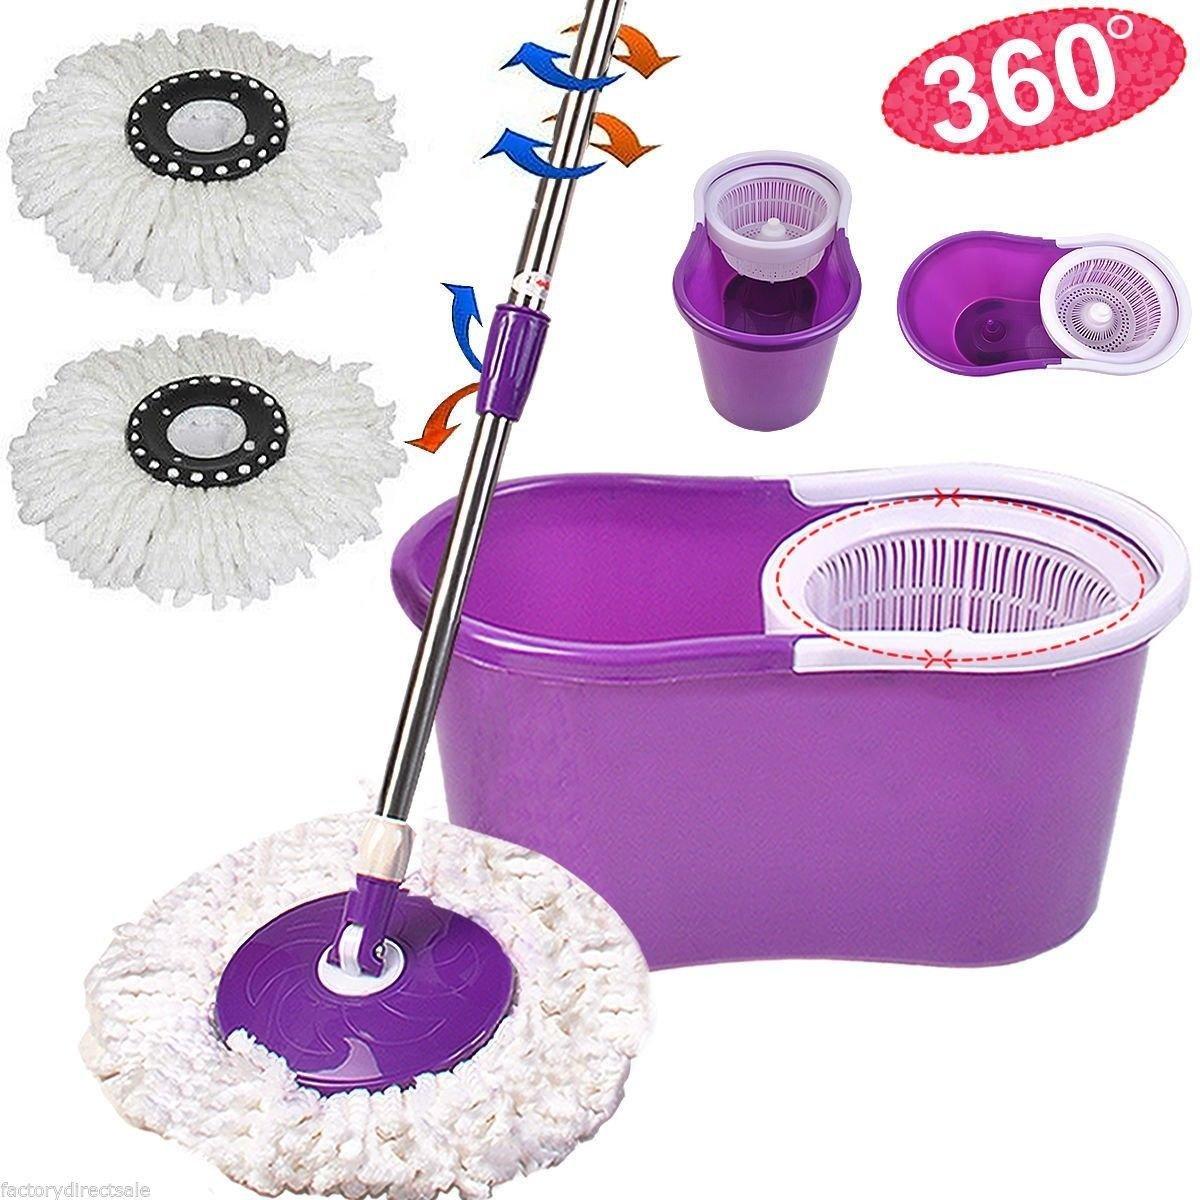 Amazon.com: Easy Magic Floor Mop 360? Bucket 2 Heads Microfiber Spin ...